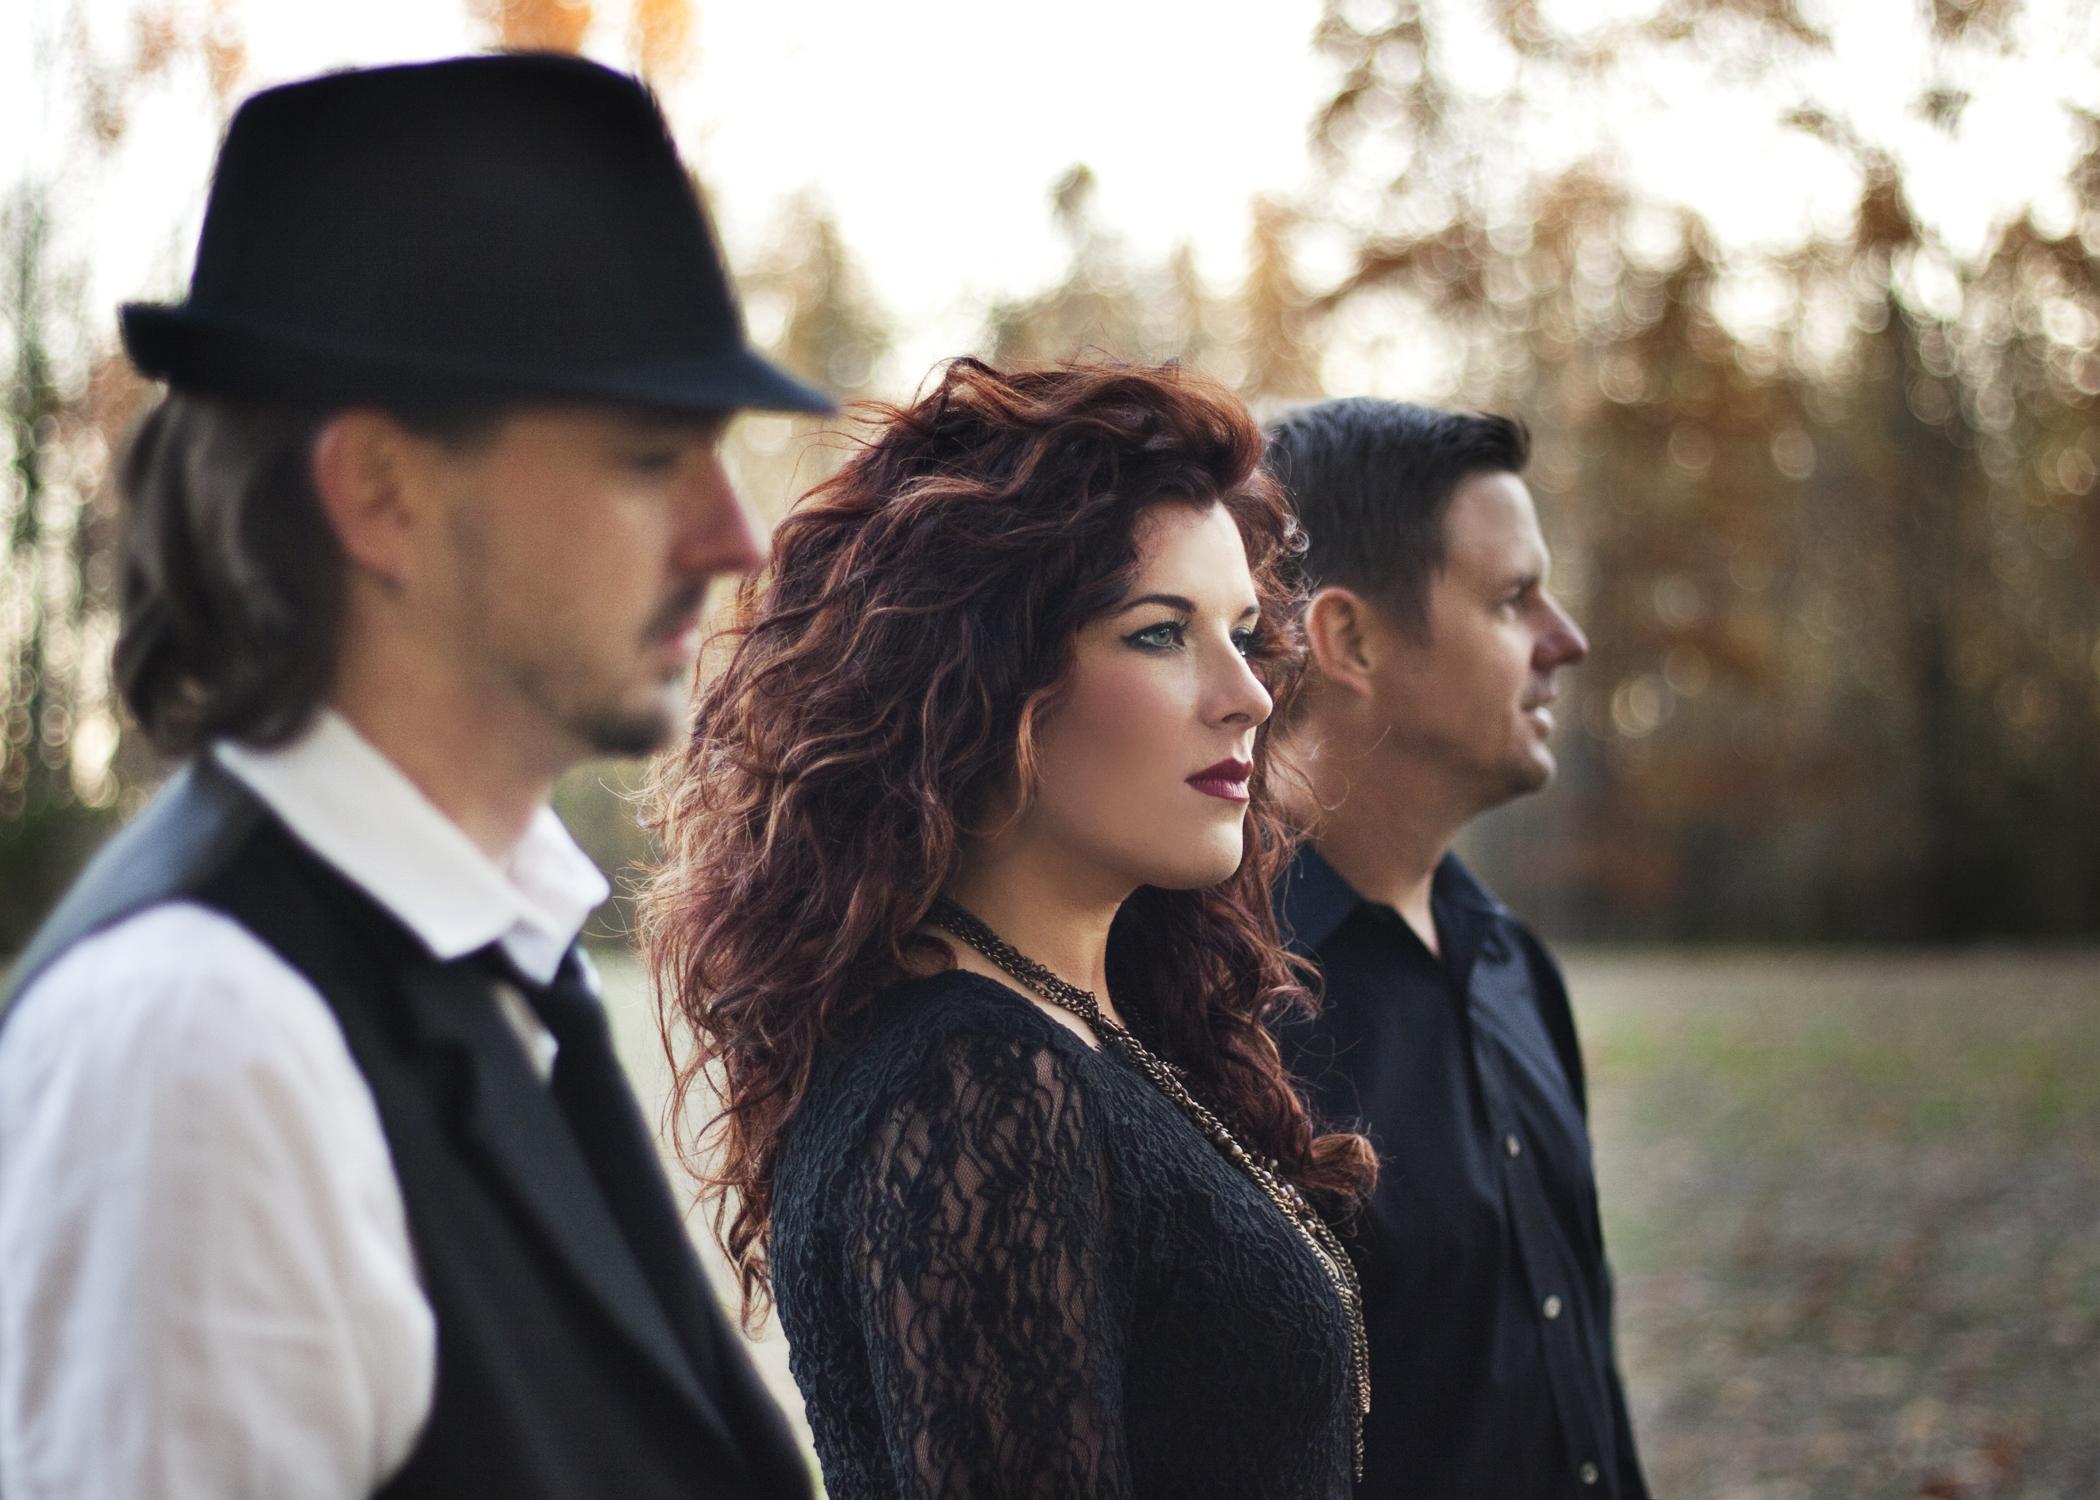 The band, Avonlea